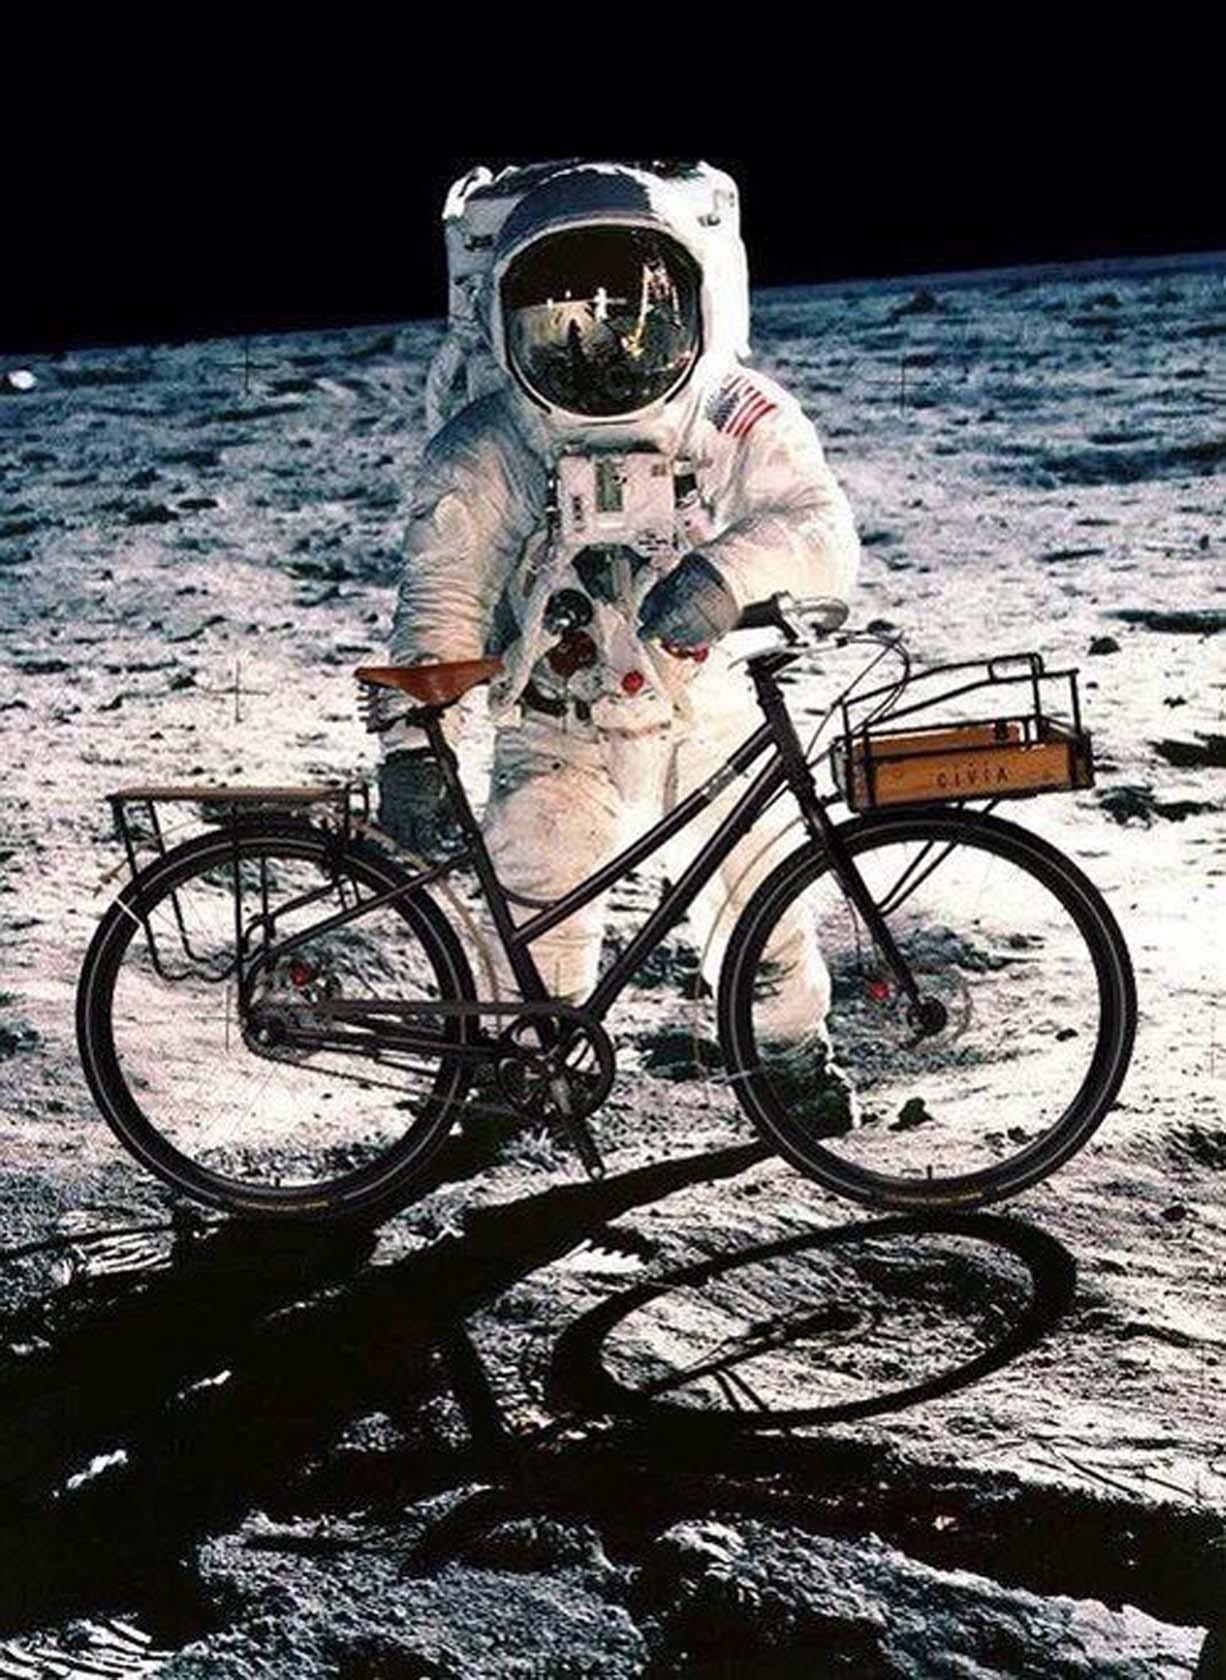 bici sulla luna